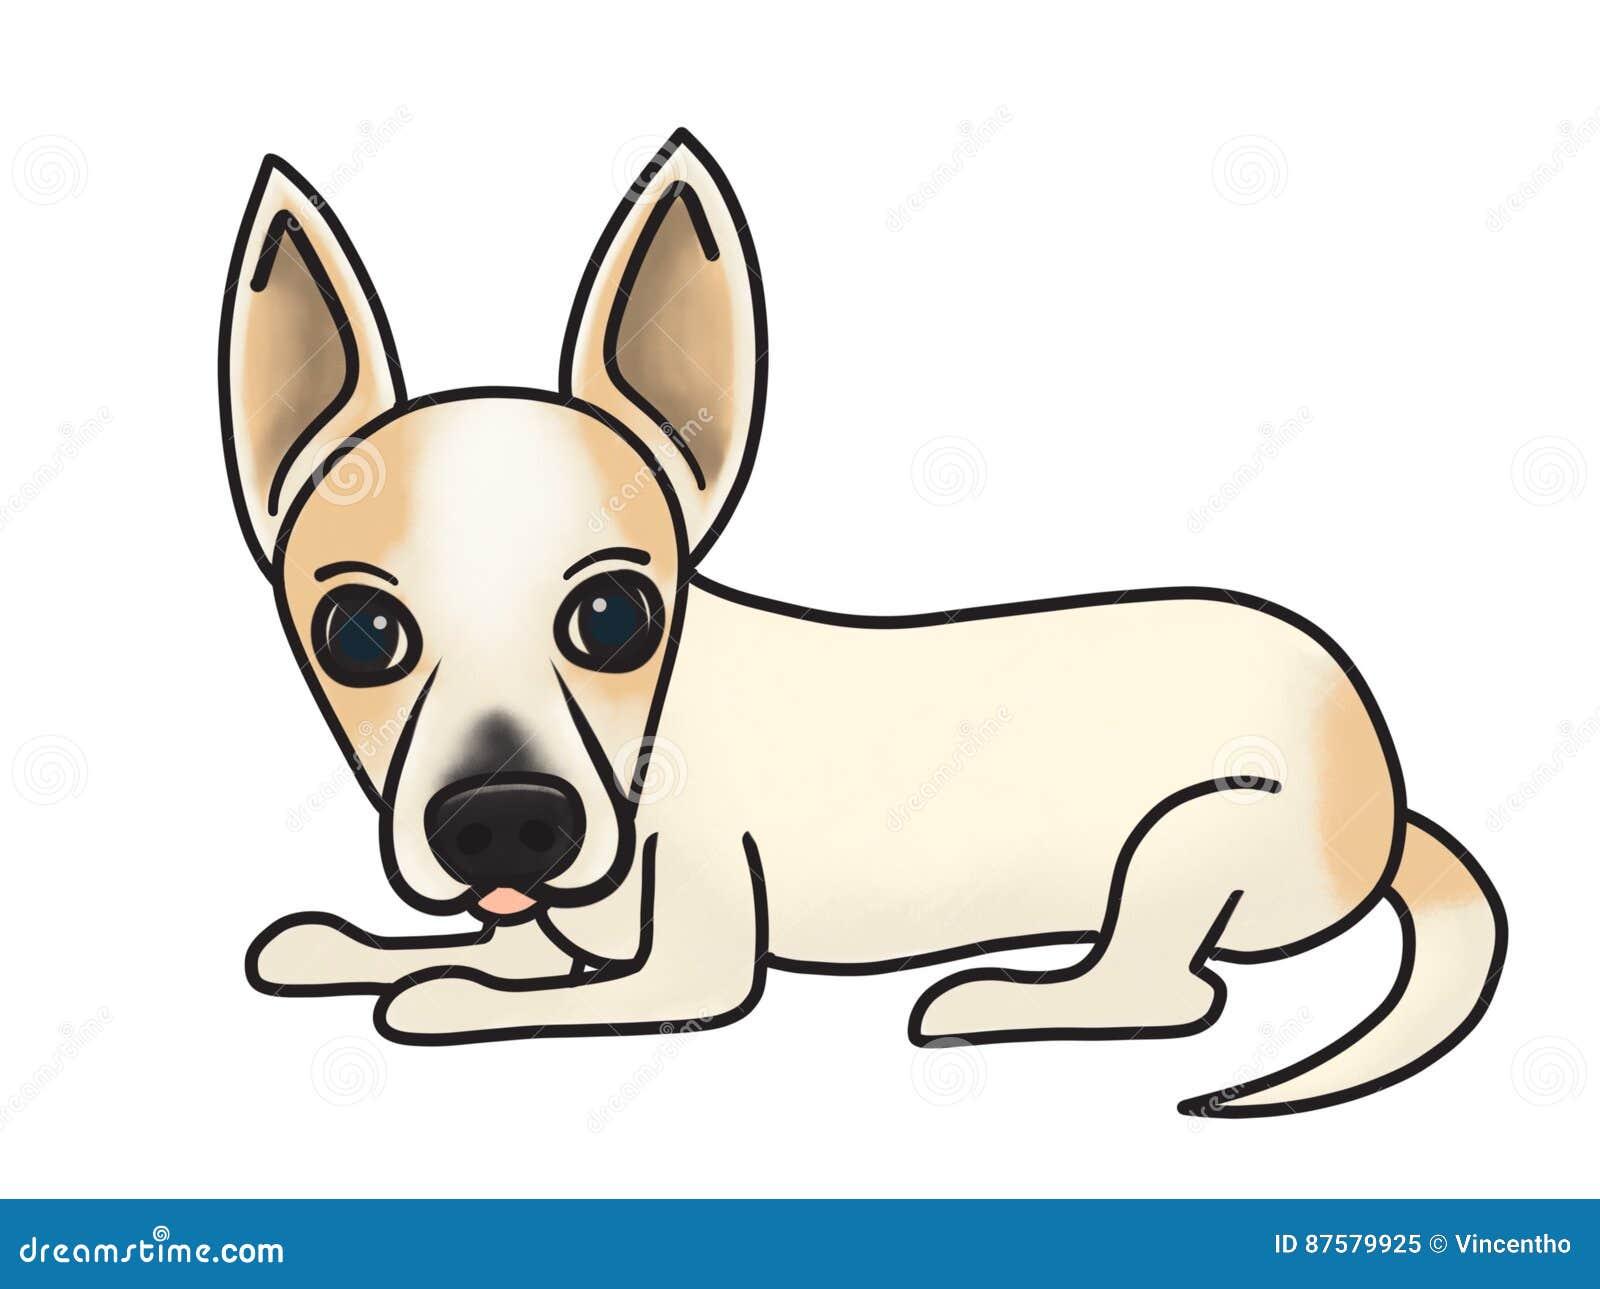 mixed breed dog support adoption cartoon illustration stock image